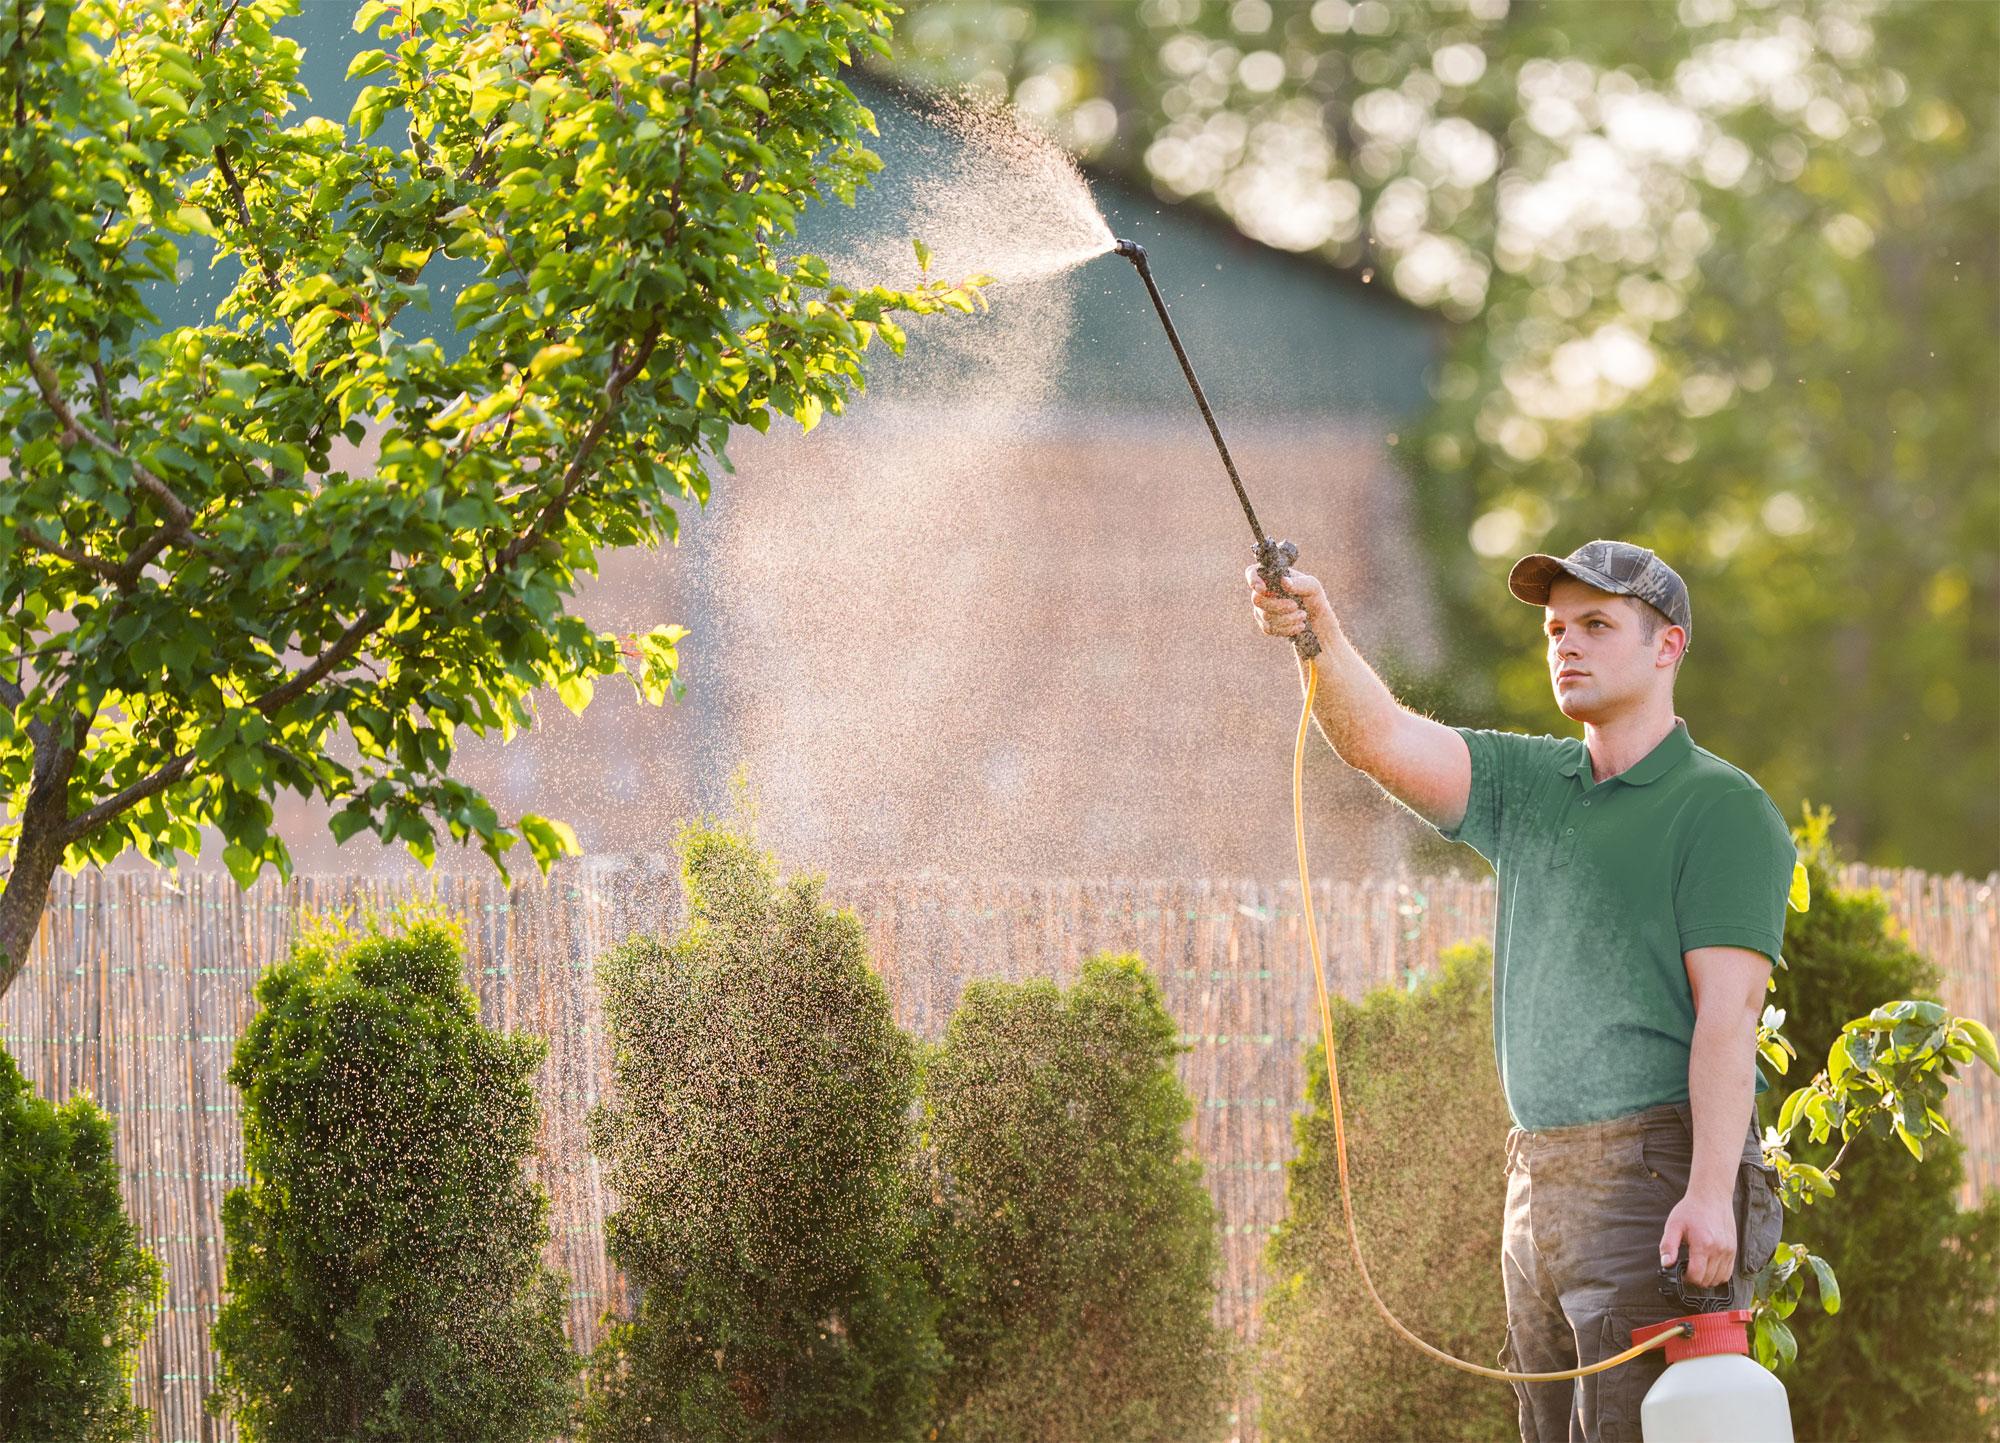 technician spraying tree branch